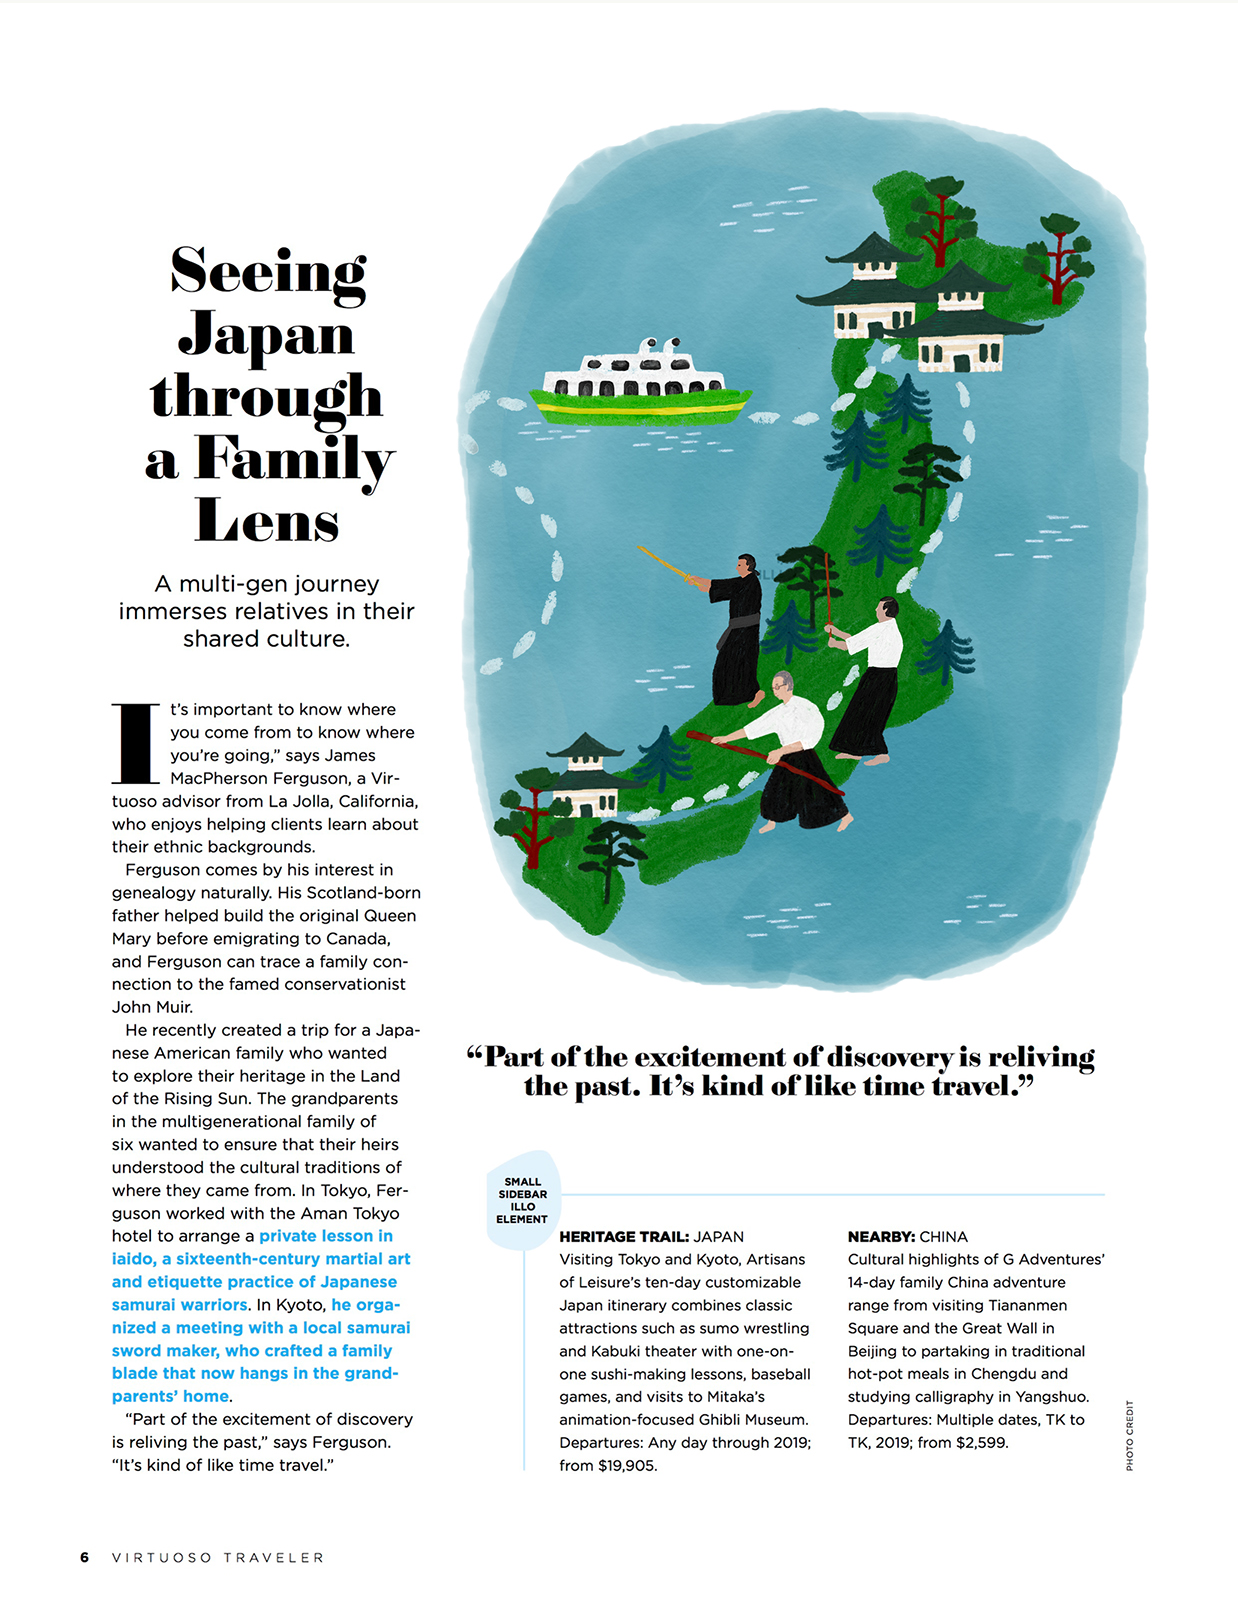 Virtuoso genealogy travel - Sketch 12.jpg